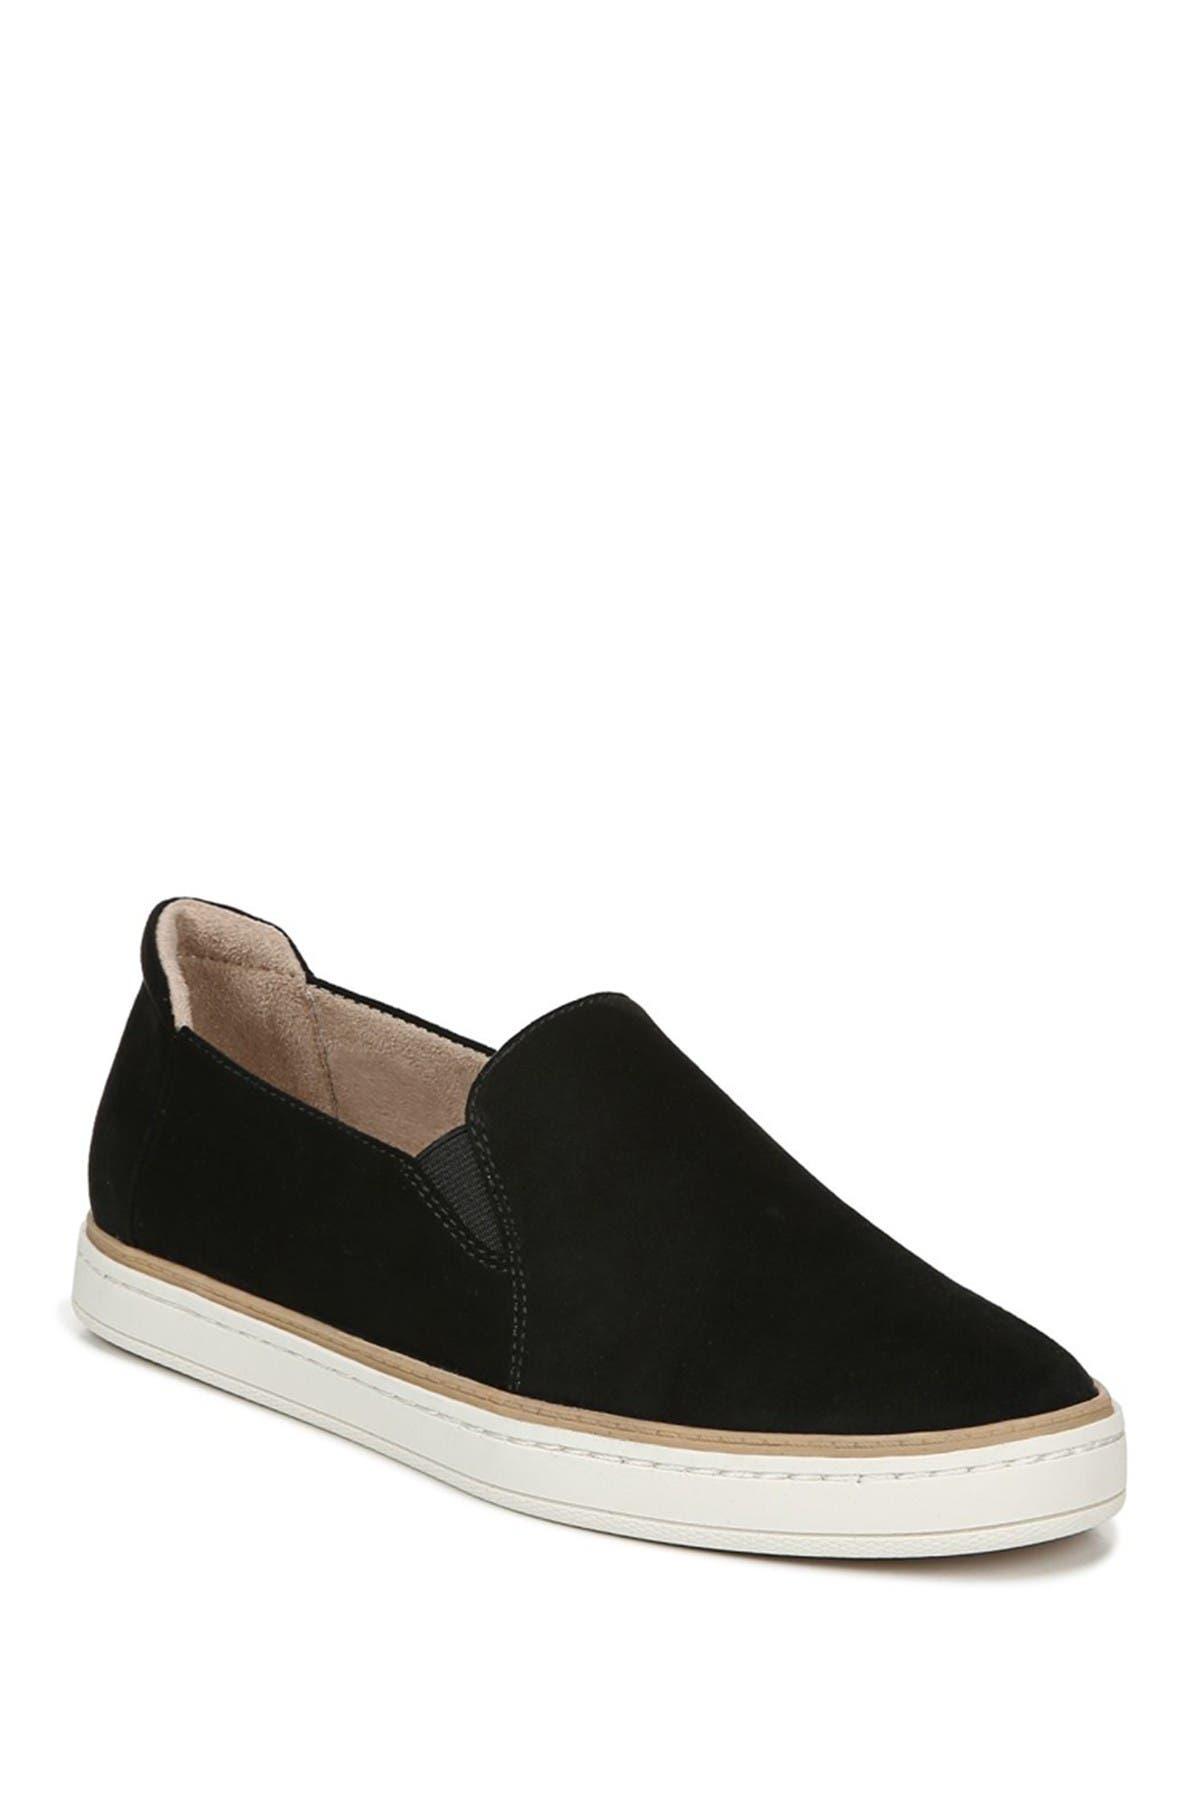 Image of SOUL Naturalizer Kemper 2 Slip-On Sneaker